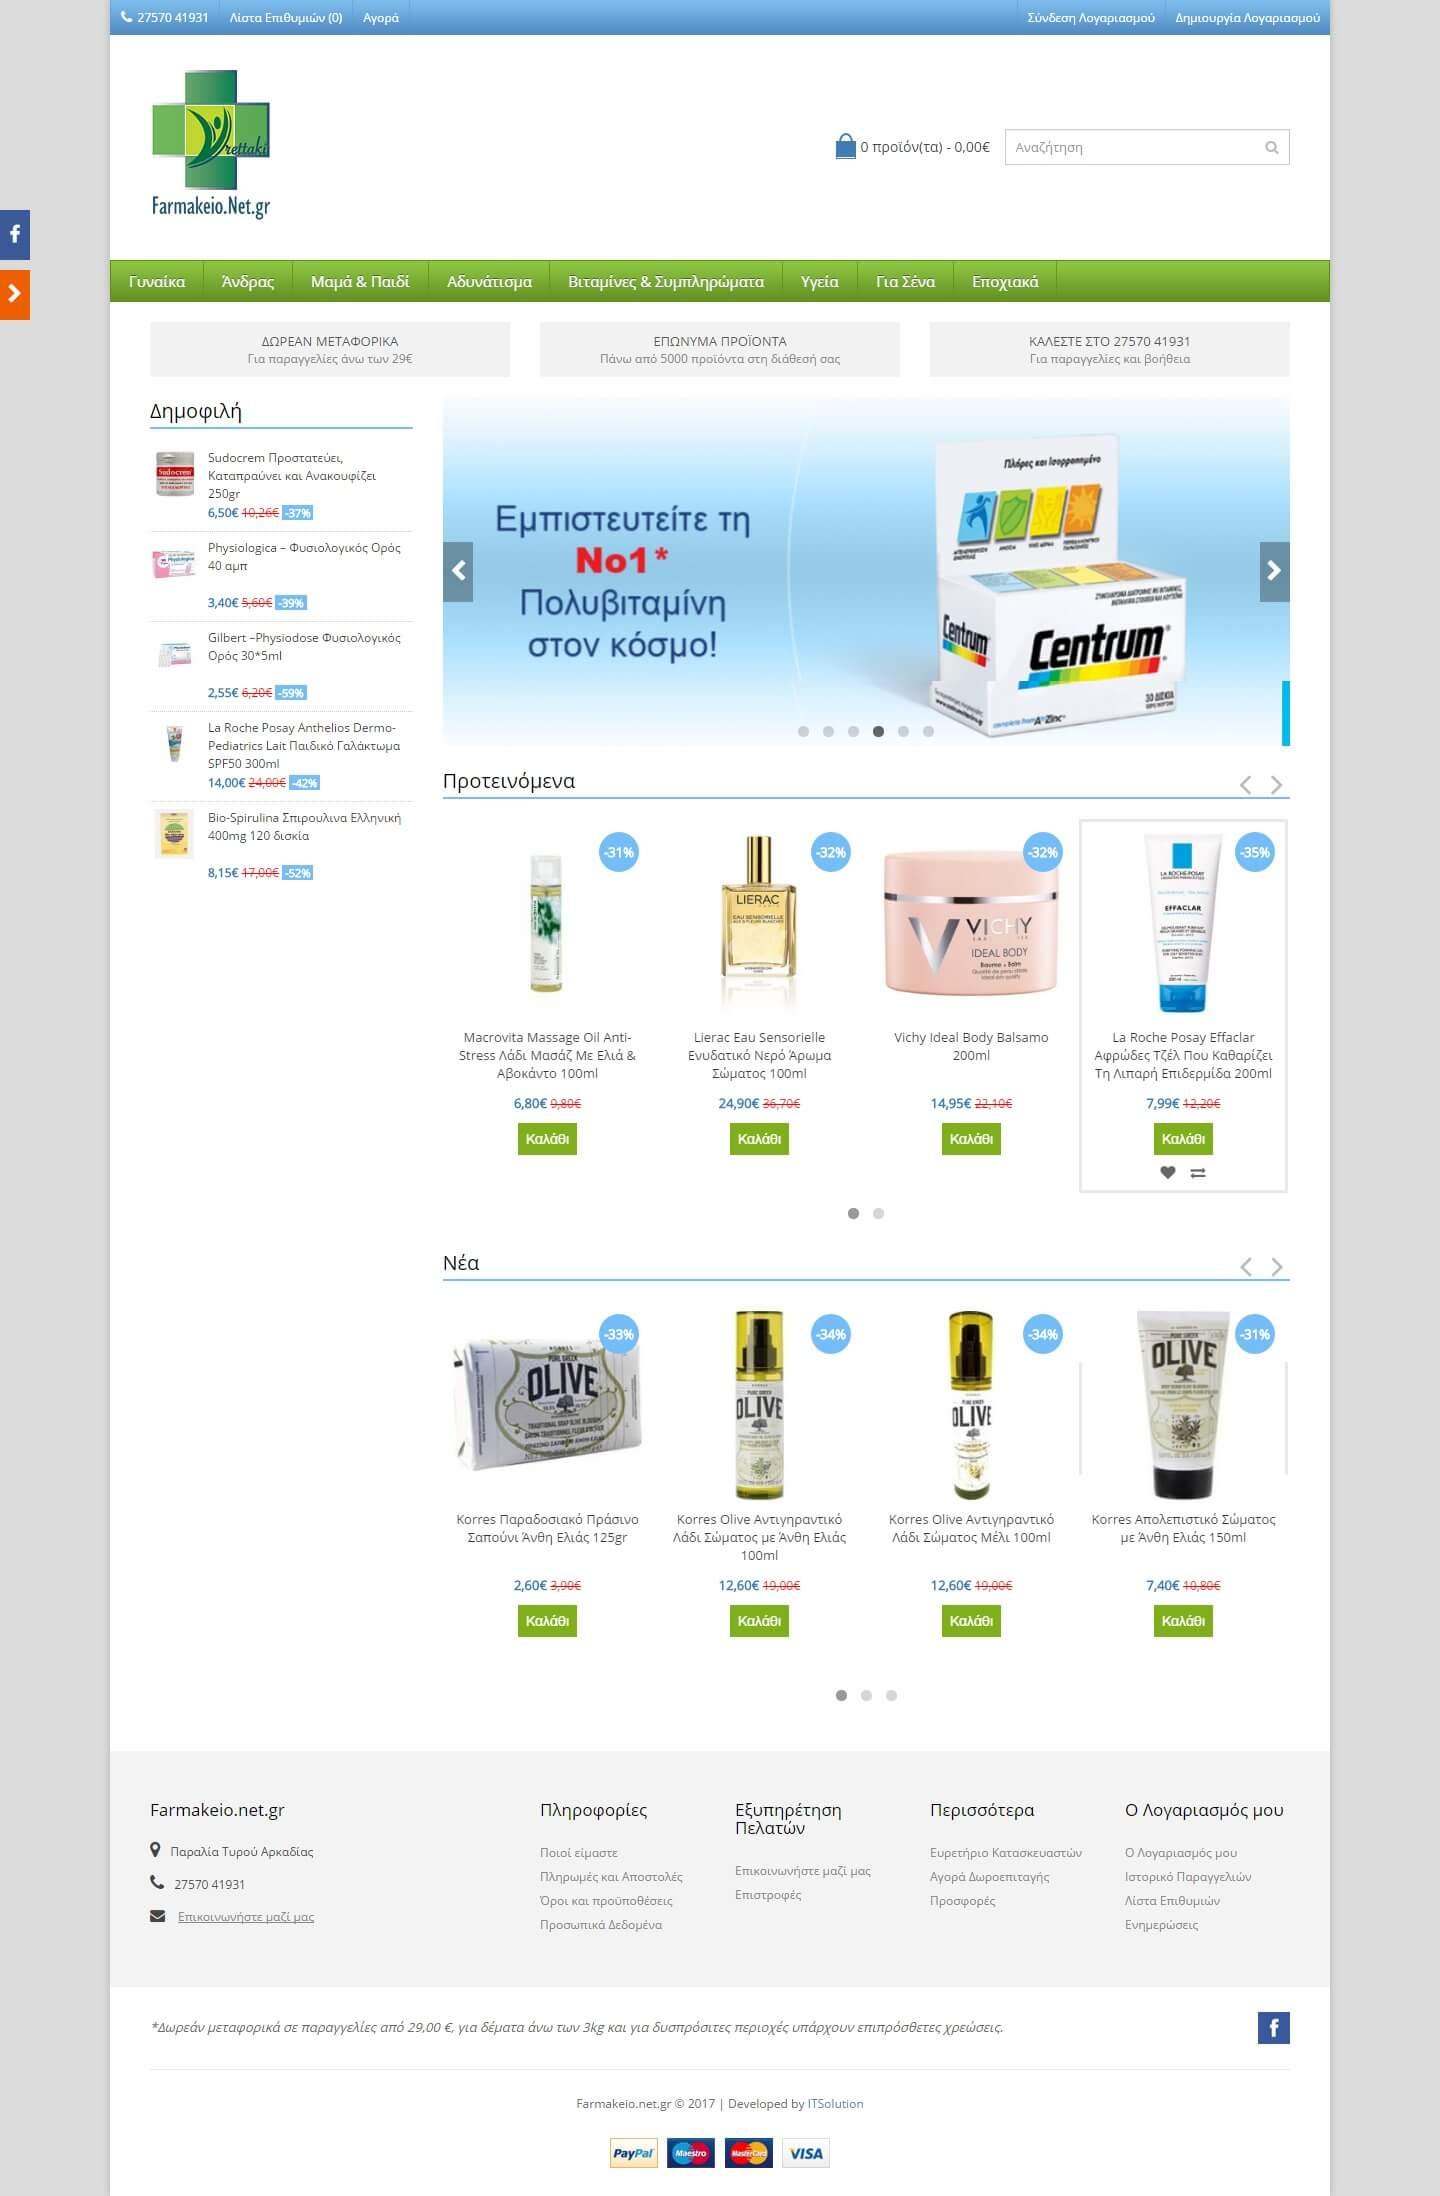 Farmakeio.net.gr